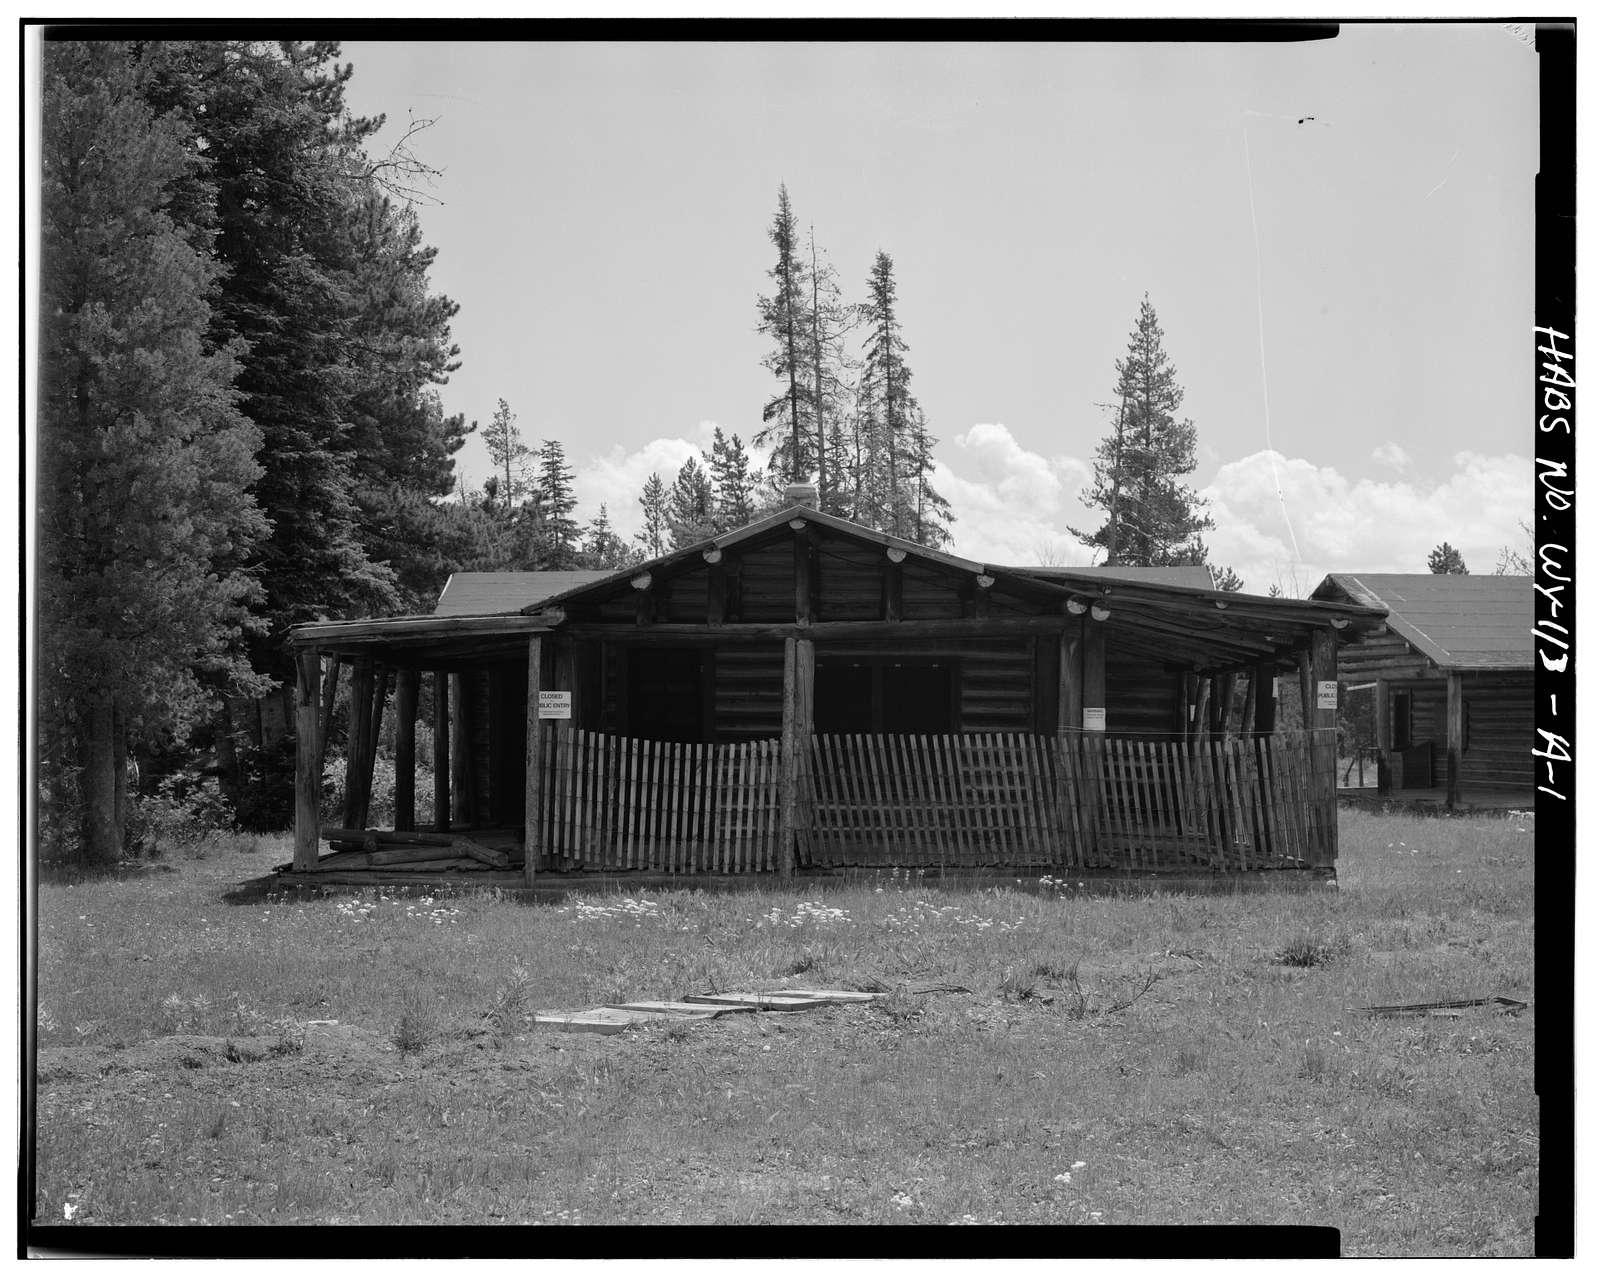 Geraldine Lucas Homestead, Geraldine Lucas Cabin, West bank Cottonwood Creek, 2.5 miles downstream from Jenny Lake, Moose, Teton County, WY